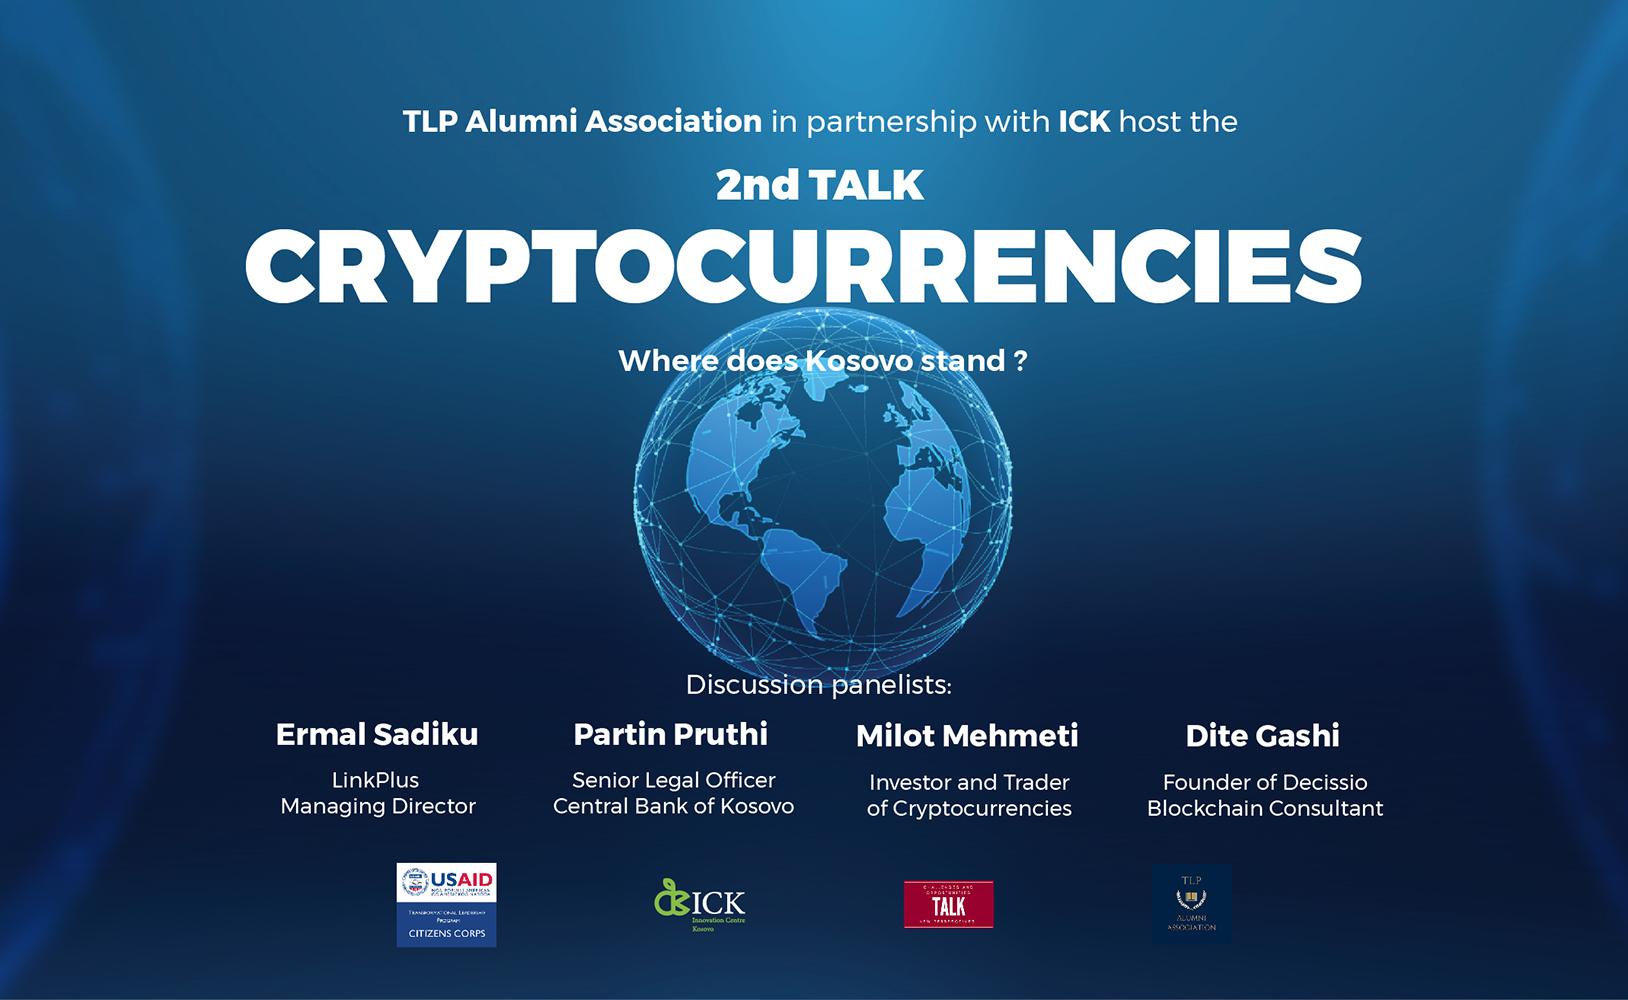 2nd TALK - Cryptocurrencies